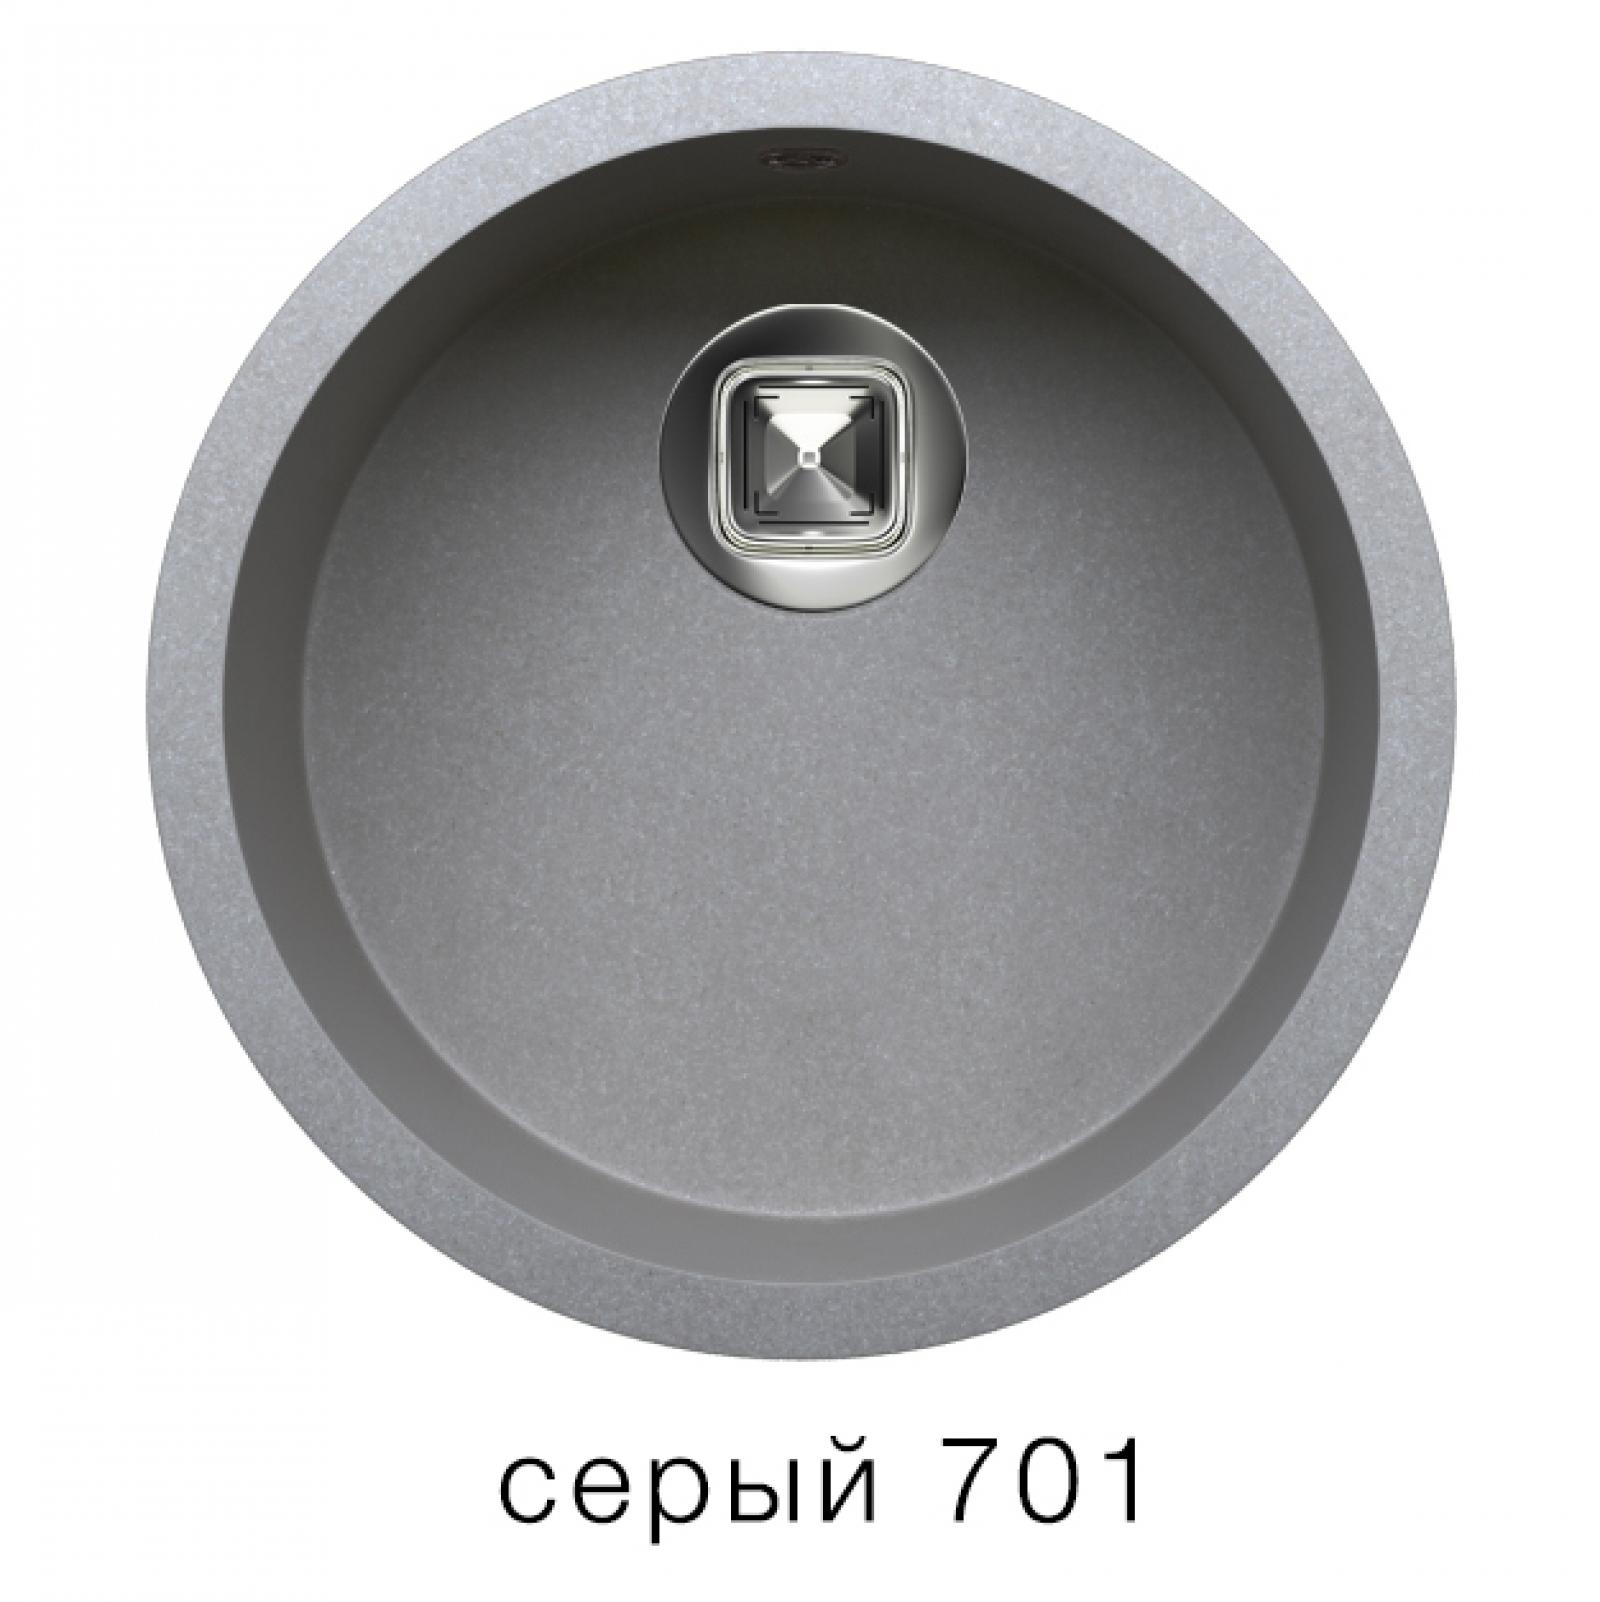 Мойка Tolero-R-104-701, цвет серый